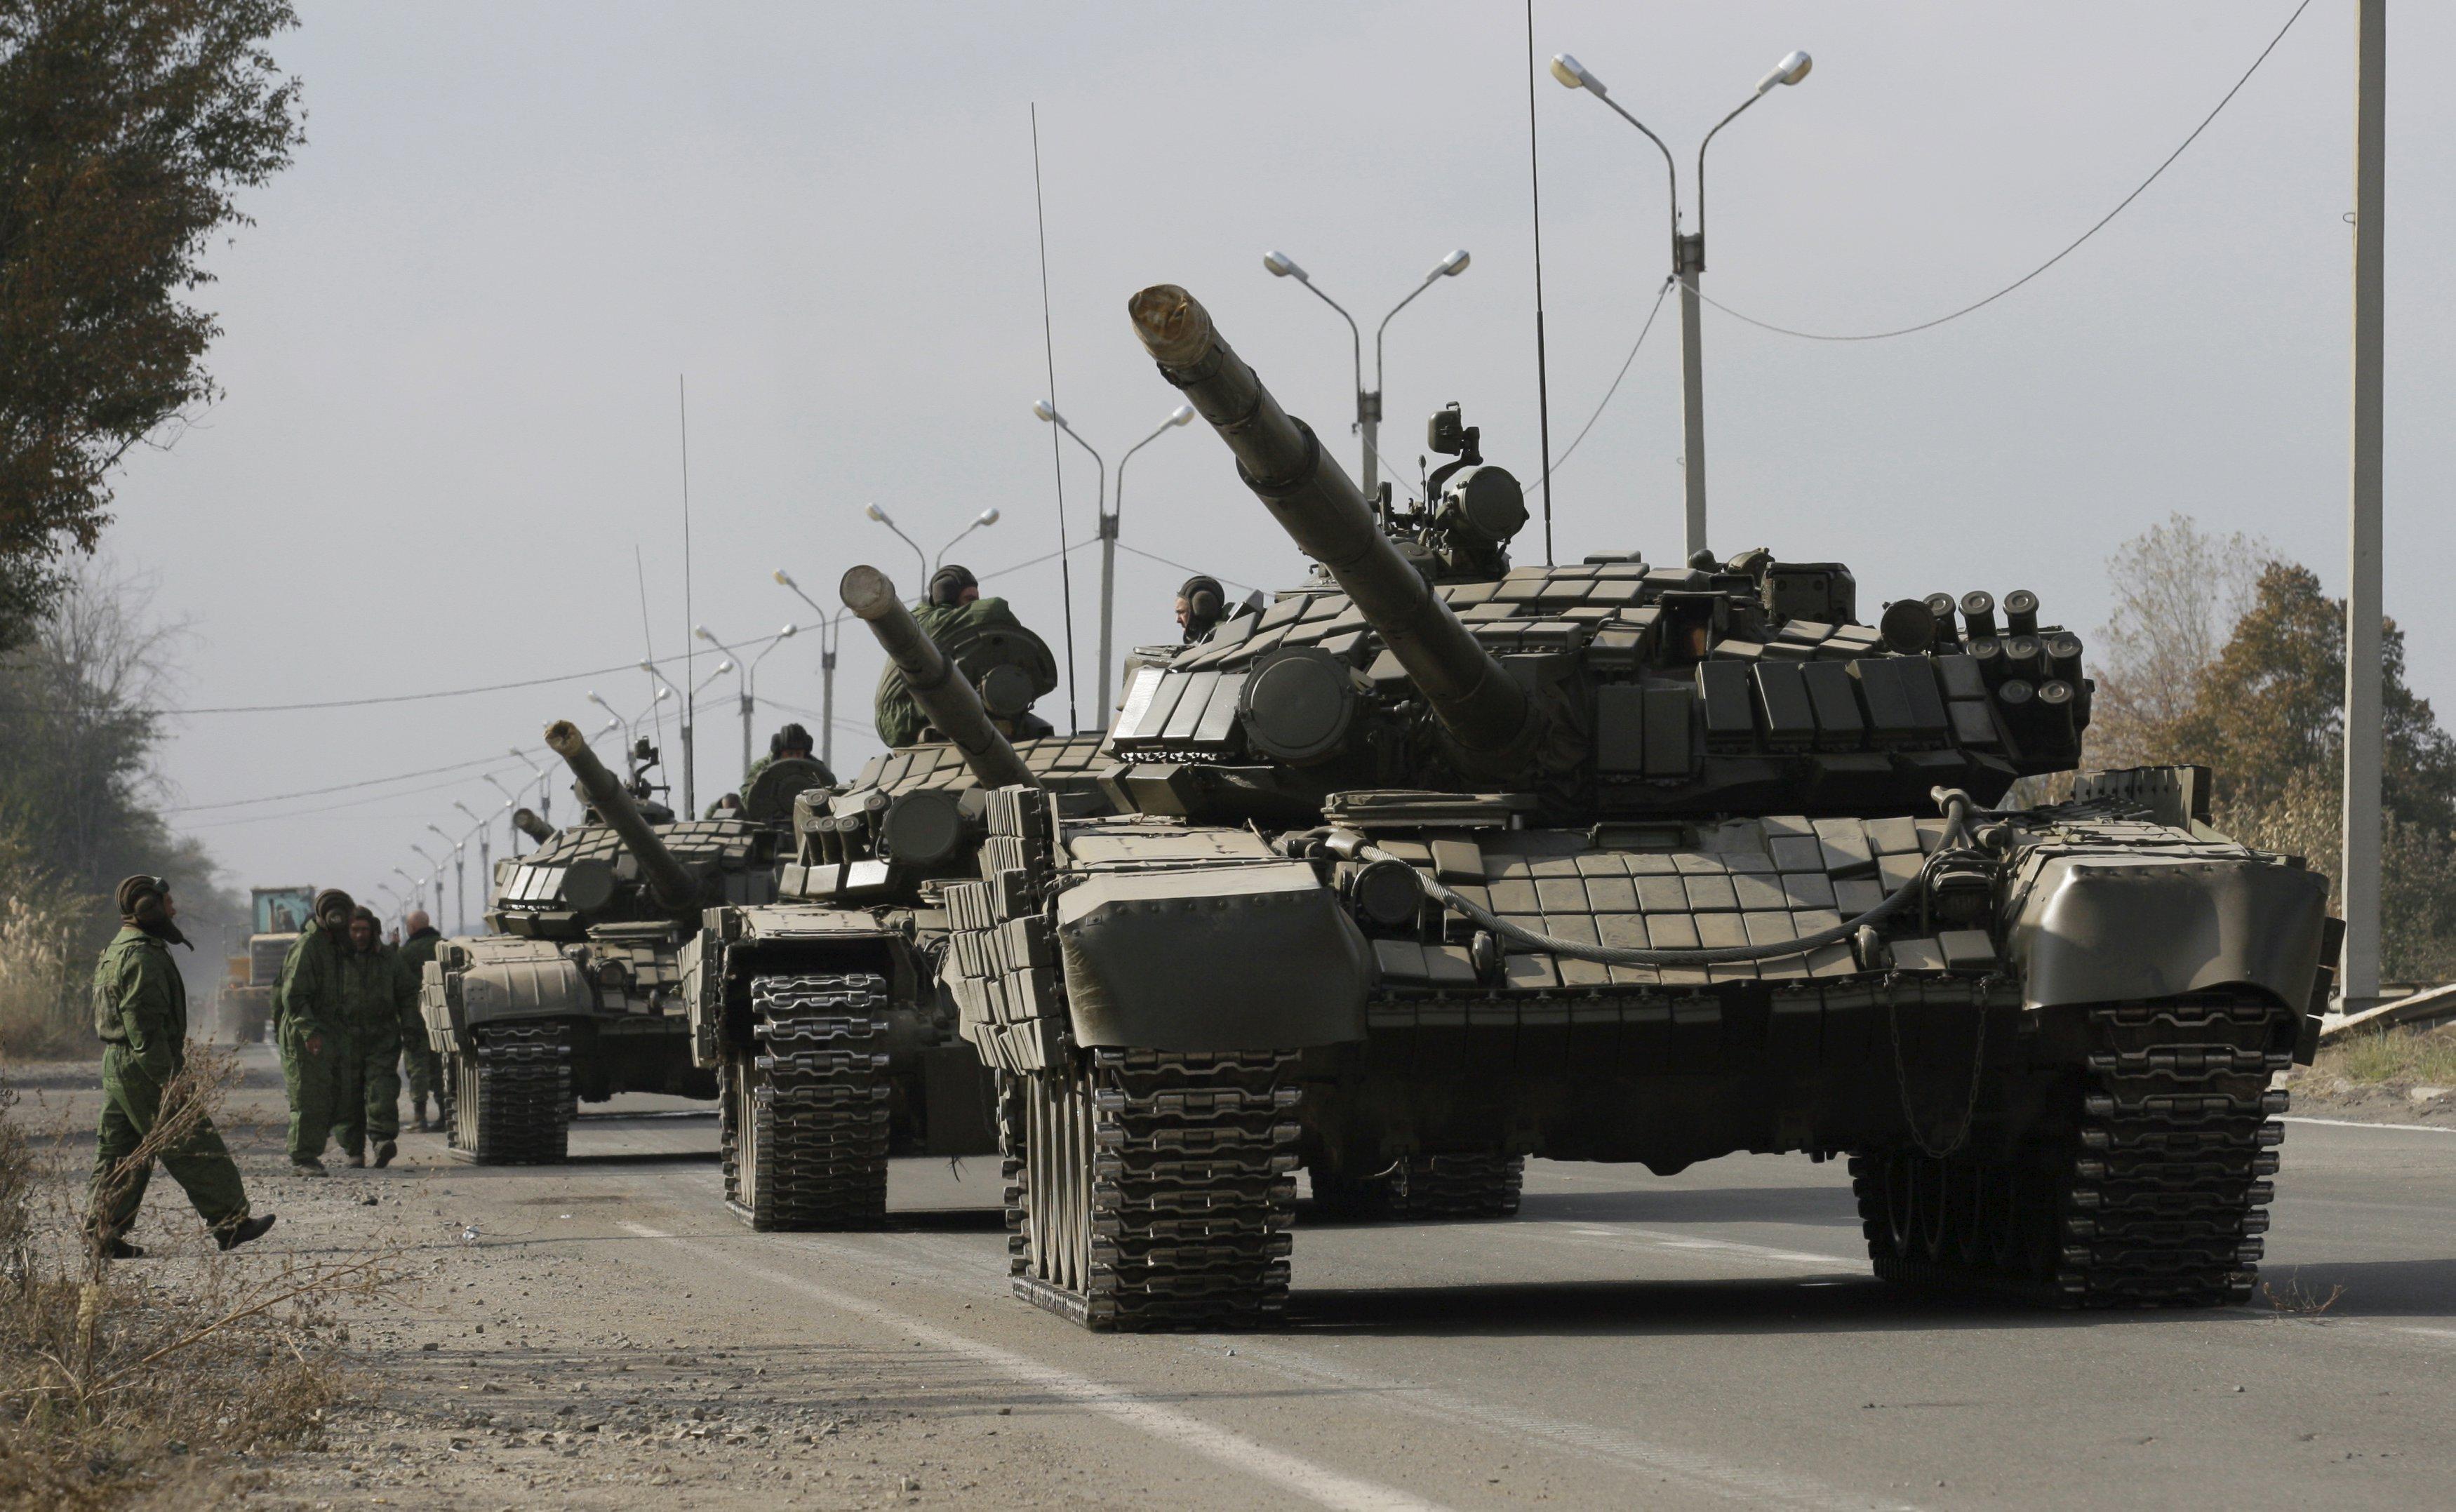 Tank-tank milik angkatan bersenjata Republik Rakyat Luhansk (LNR) diparkir di pinggir jalan saat penarikan, dekat desa Bile di wilayah Luhansk, Ukraina, Selasa (20/10). ANTARA FOTO/REUTERS/Alexander Ermochenko.